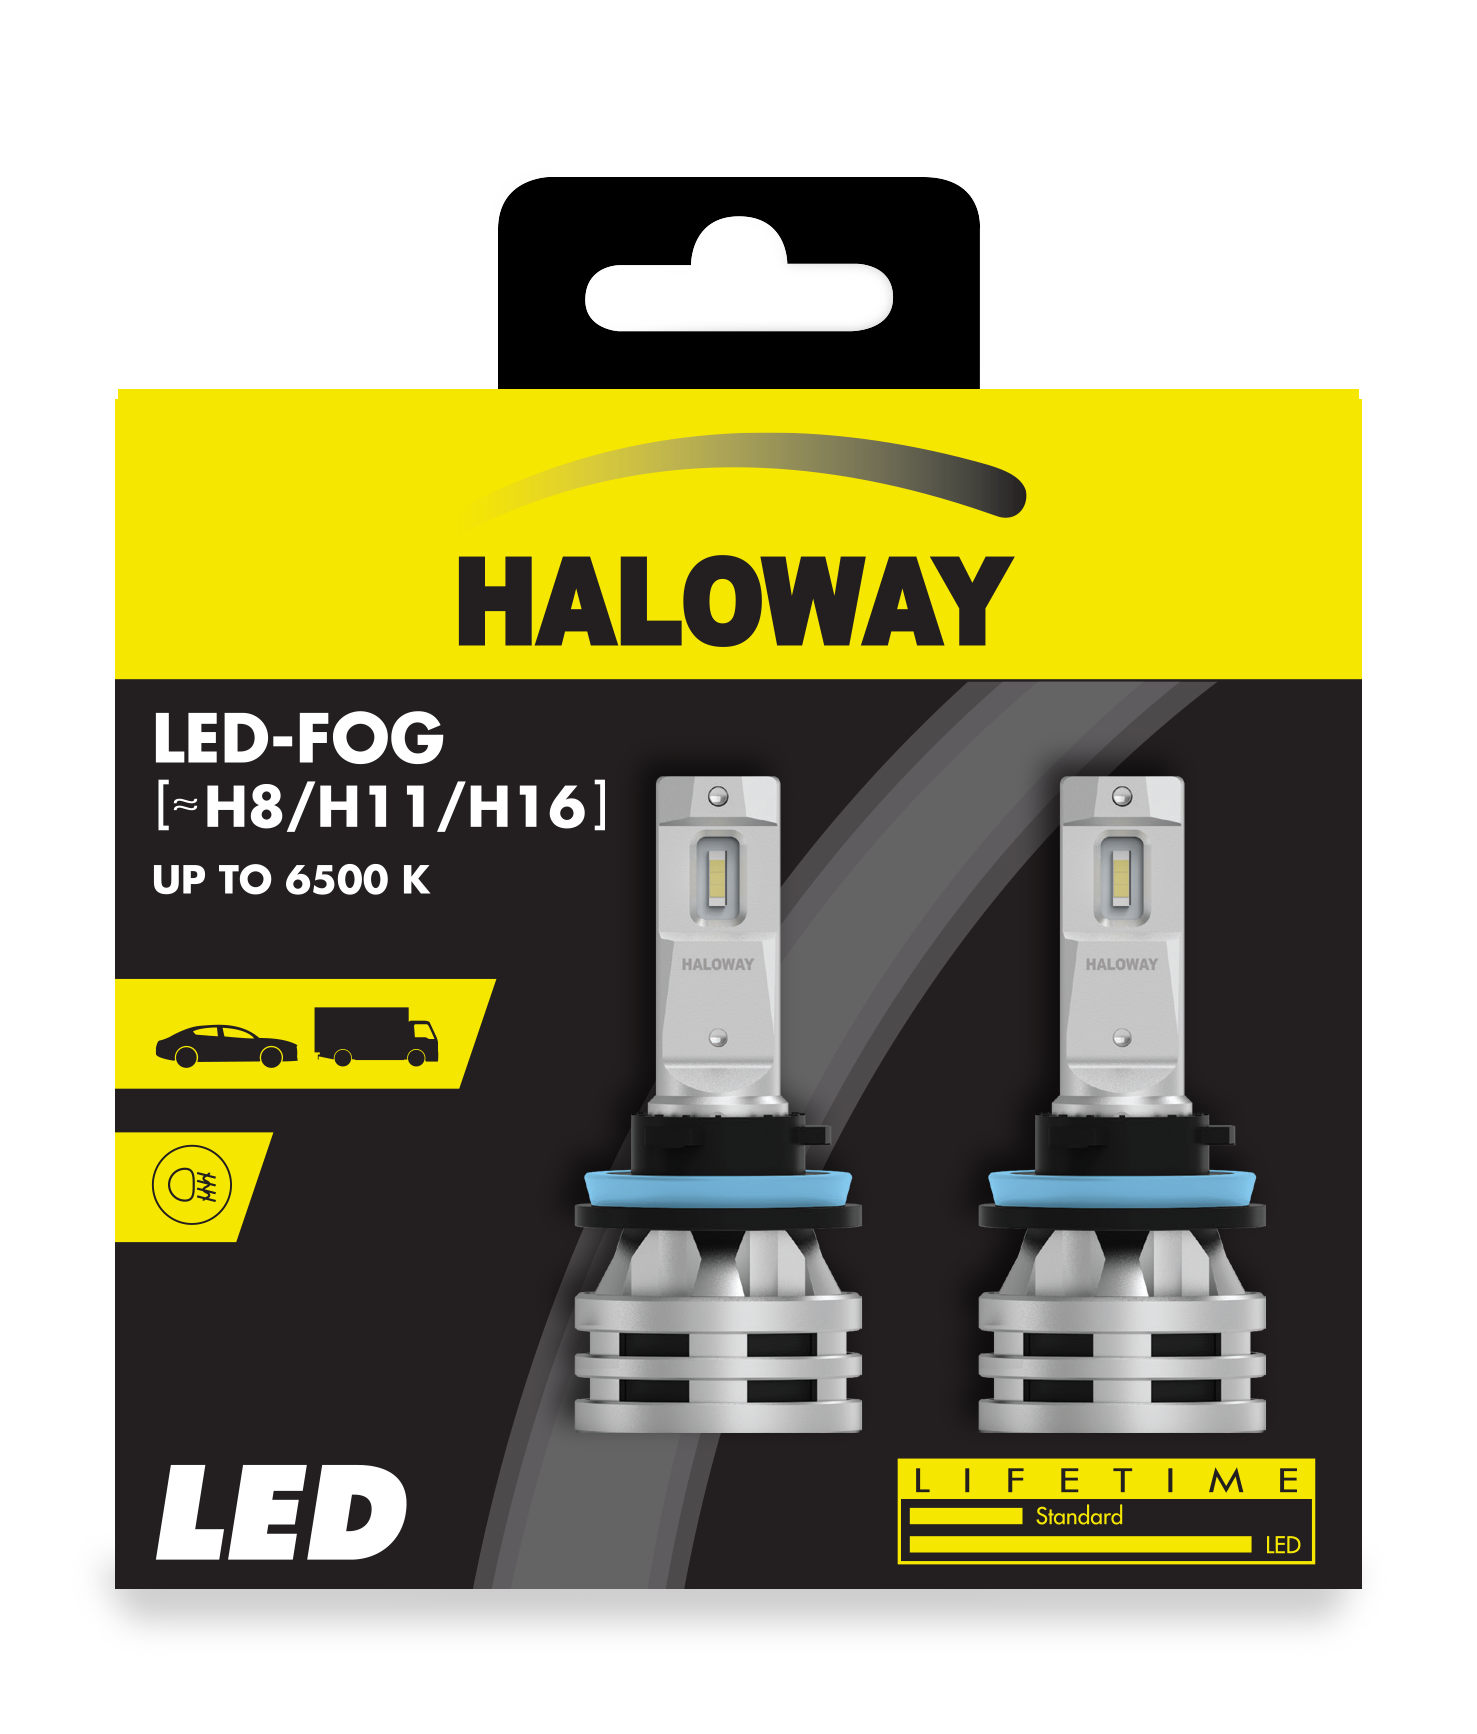 LED Fog HAL